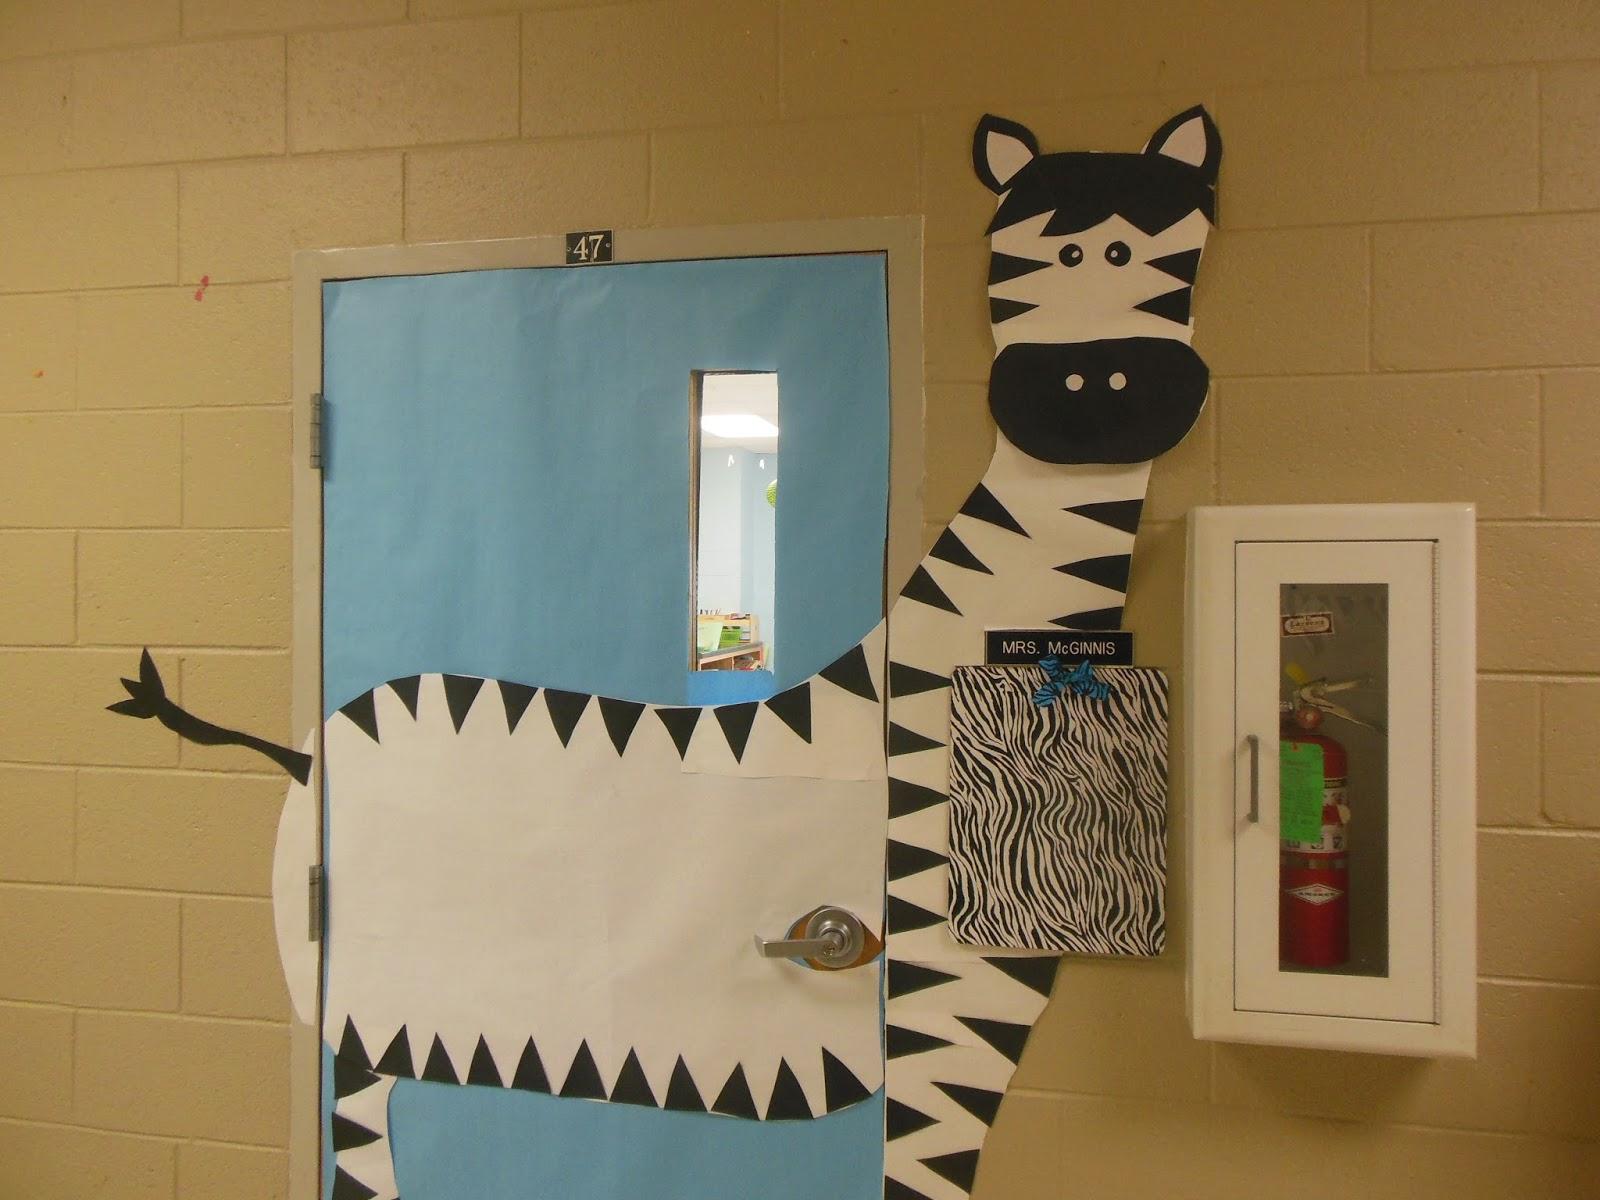 & Mrs. McGinnisu0027 Little Zizzers: My Zebra Jungle Decorations pezcame.com